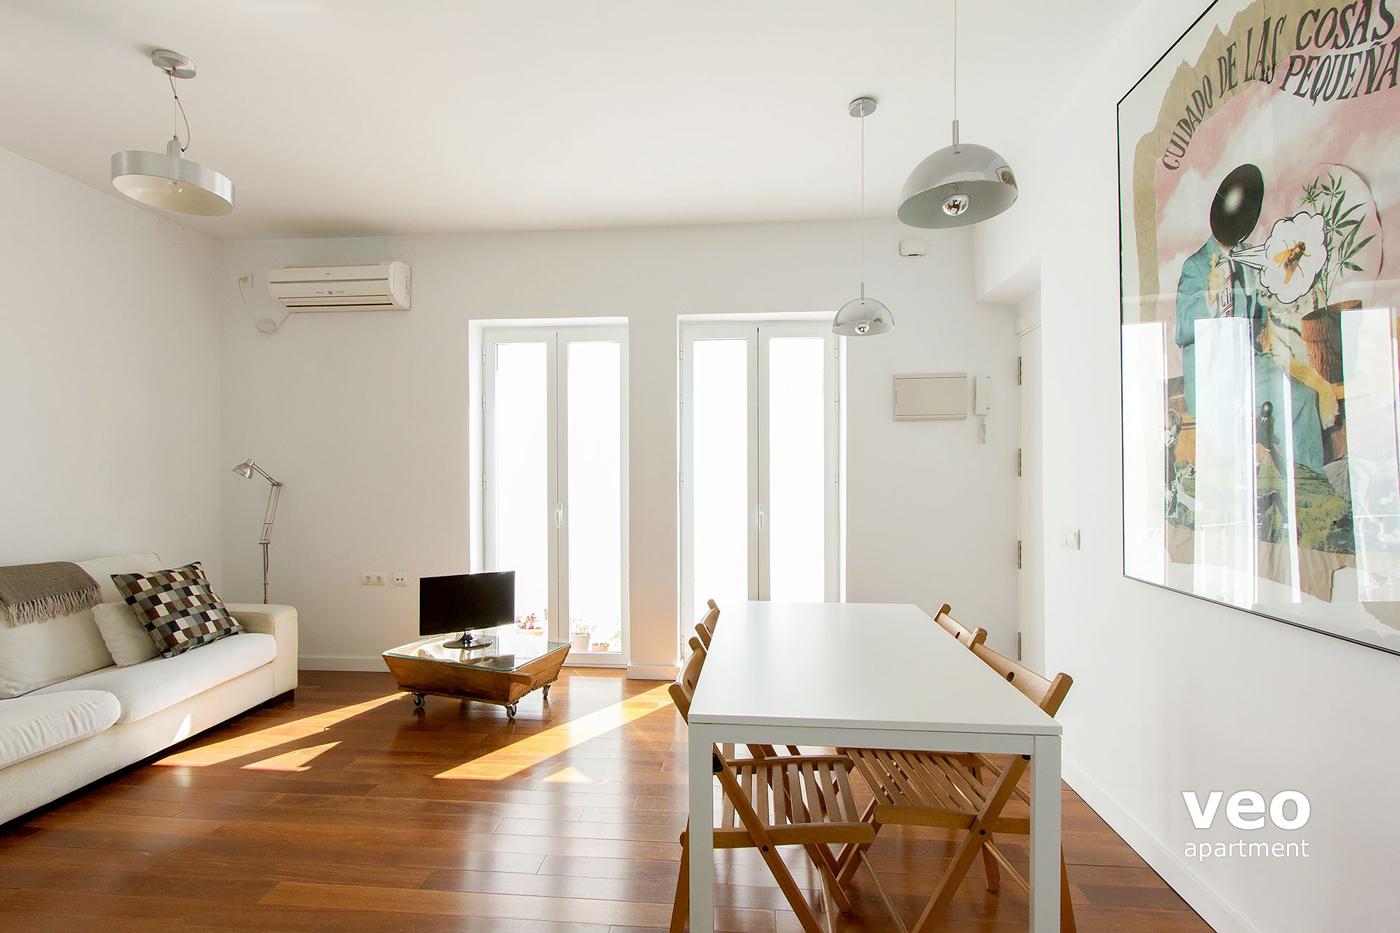 Reforma de apartamento 40 m2 03